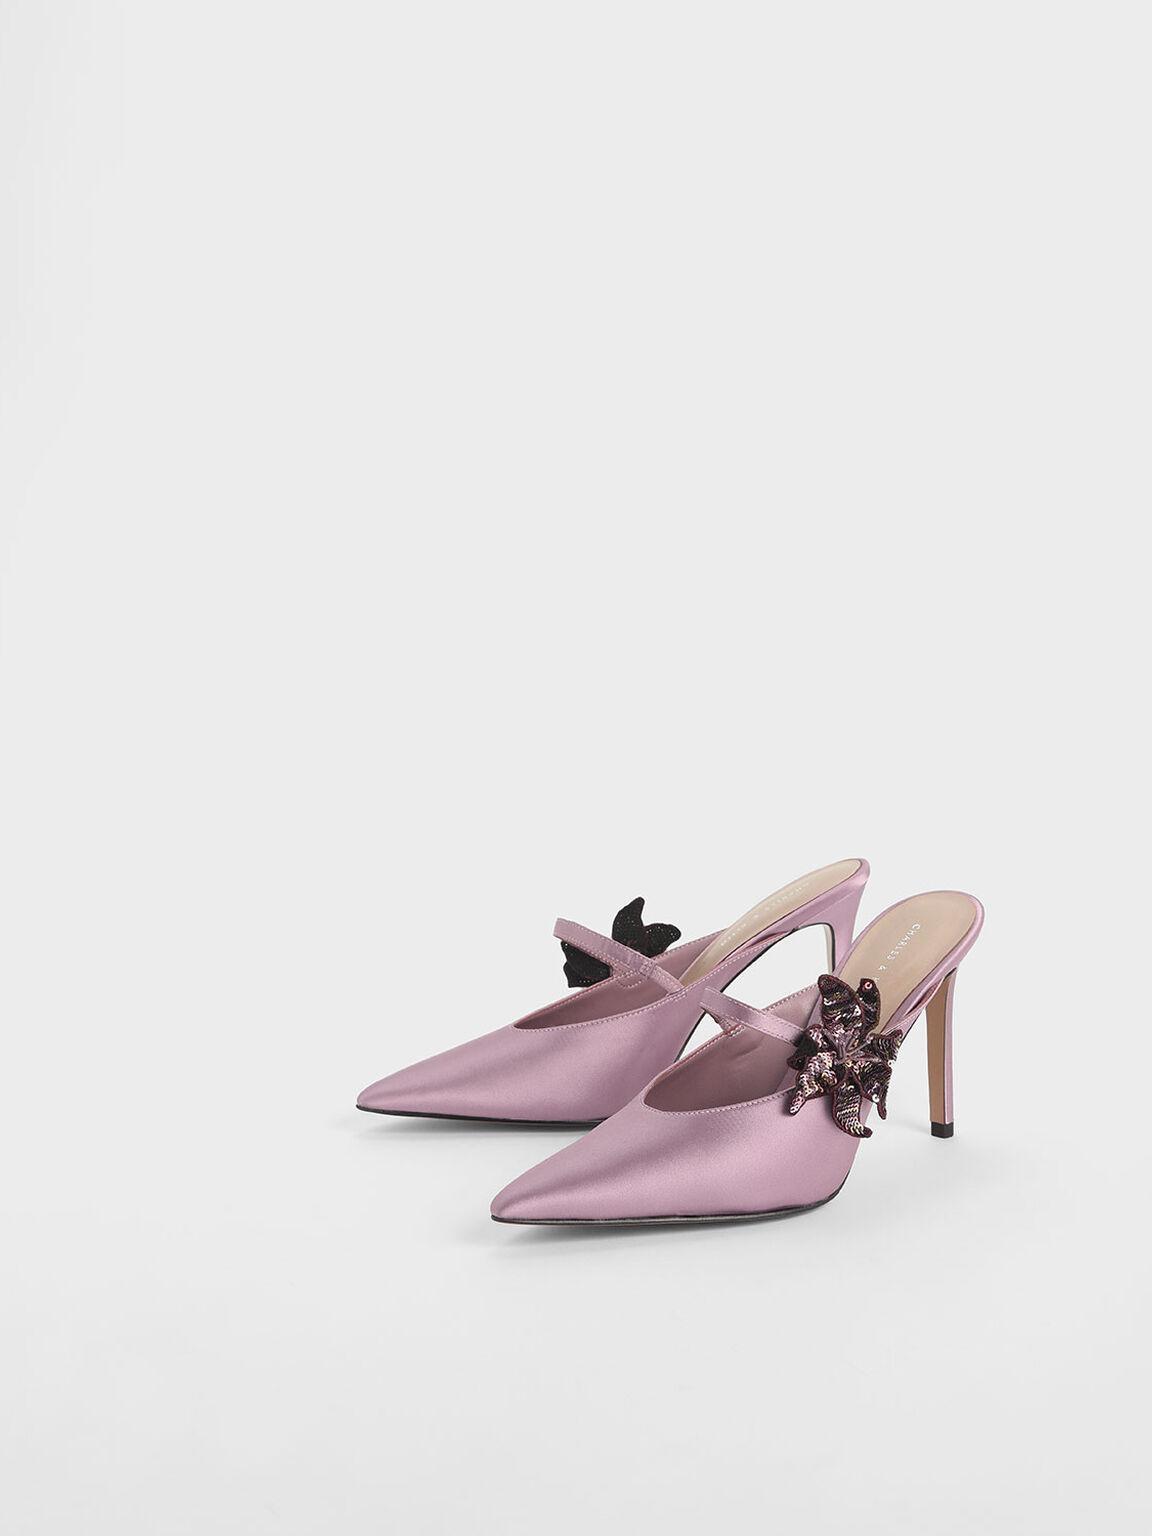 Sequin Flower Satin Mules, Pink, hi-res